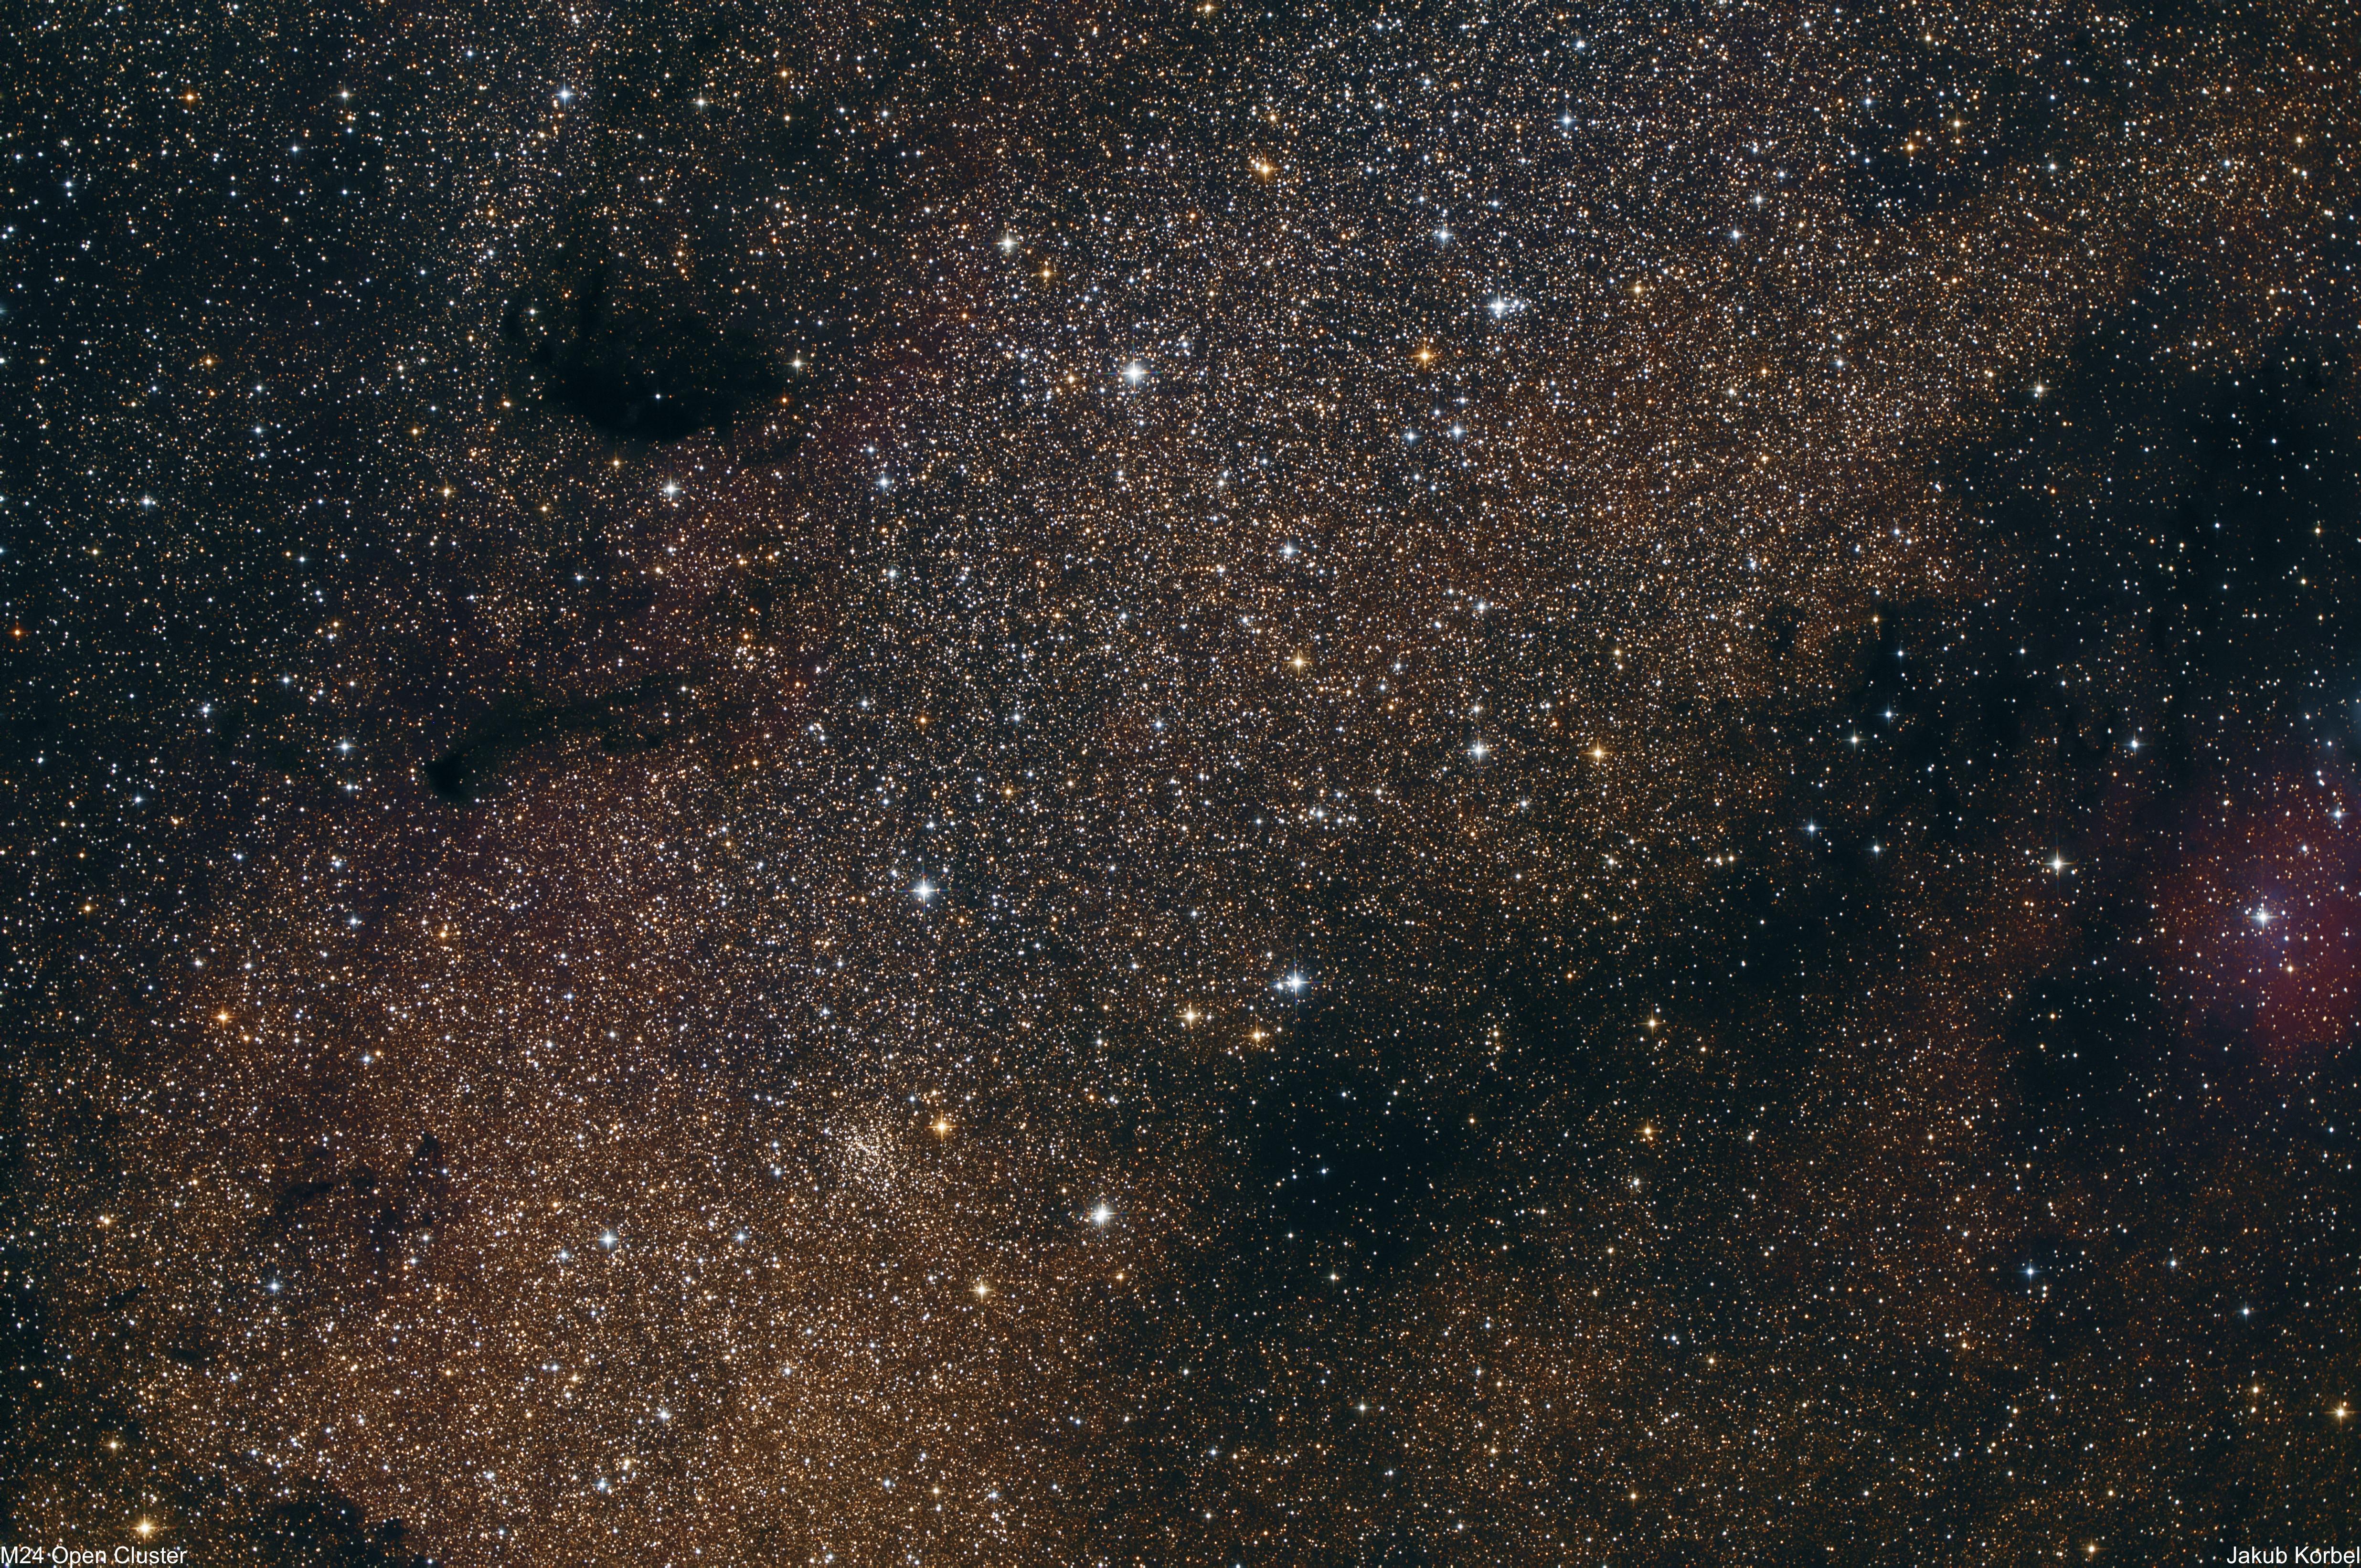 M24 Sagittarius Star Cloud – AstroFotoBlog